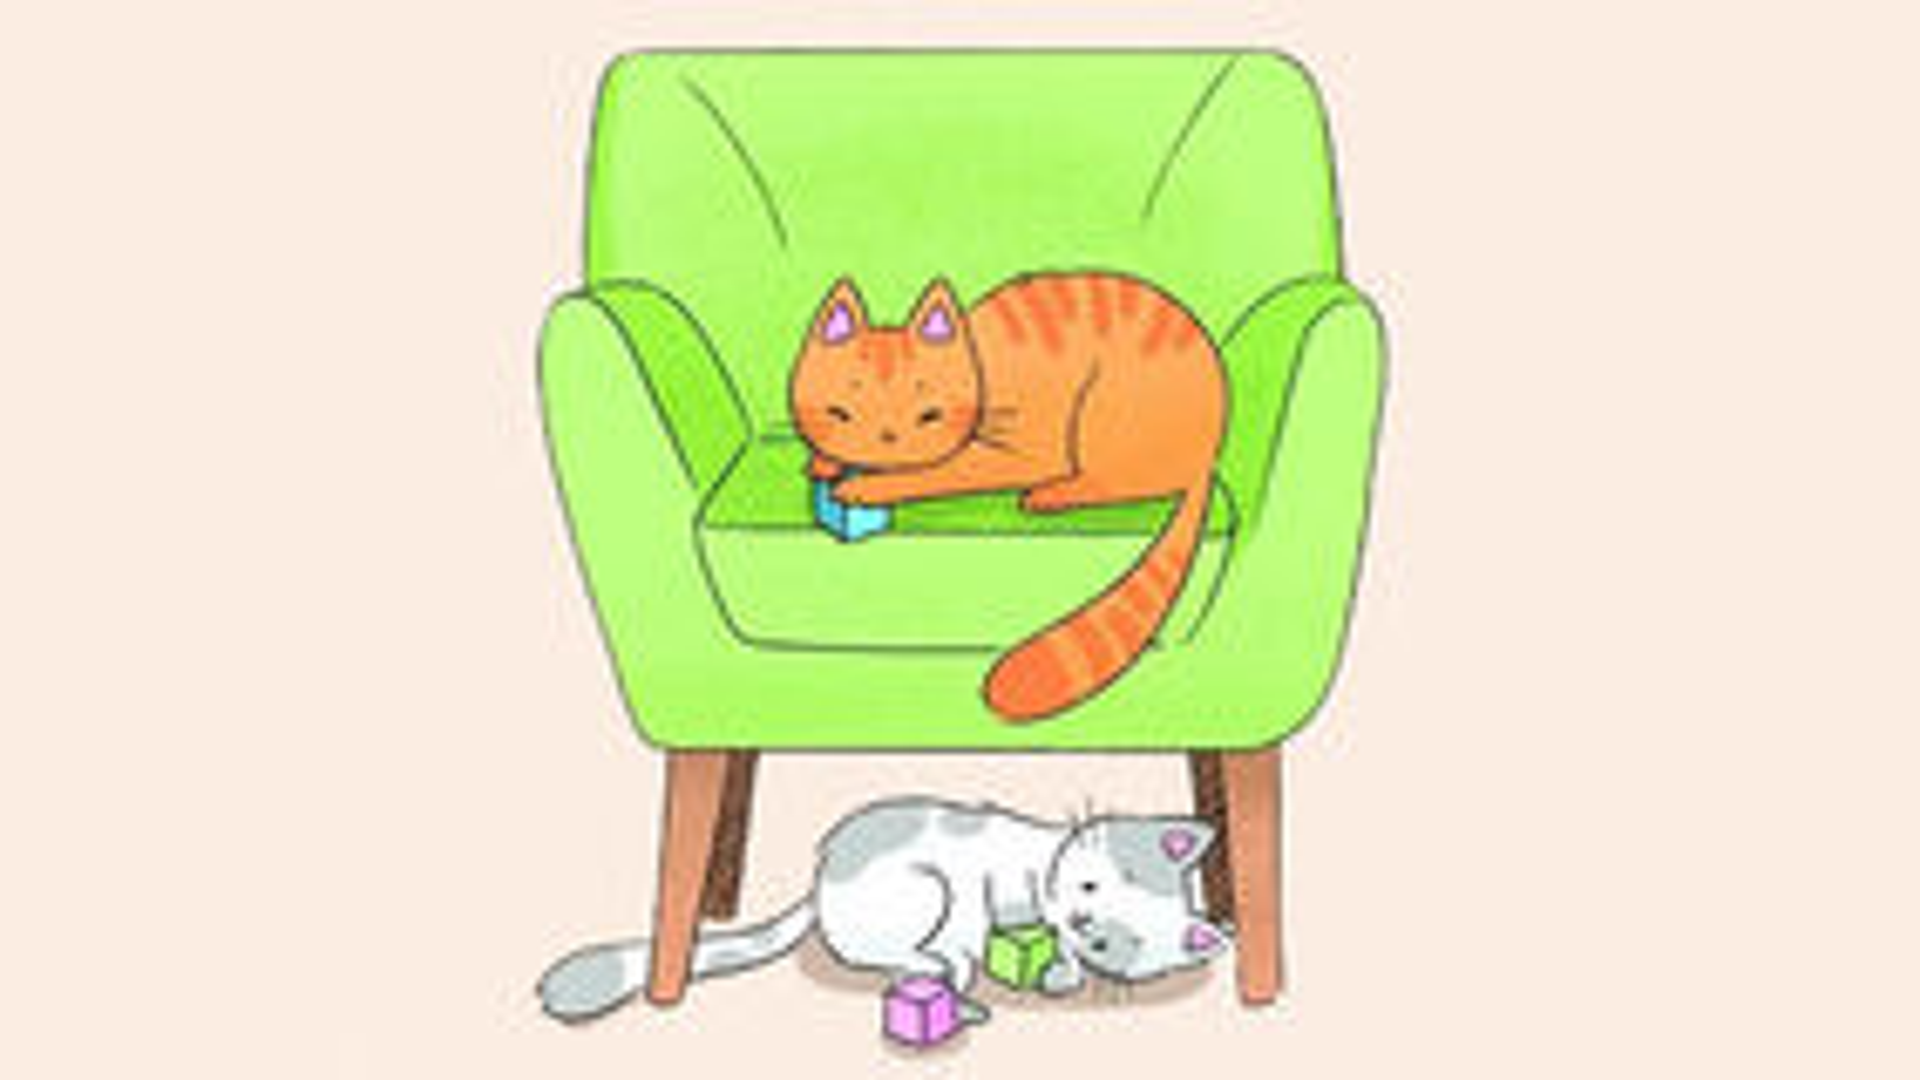 house-of-cats-game-artwork.jpg